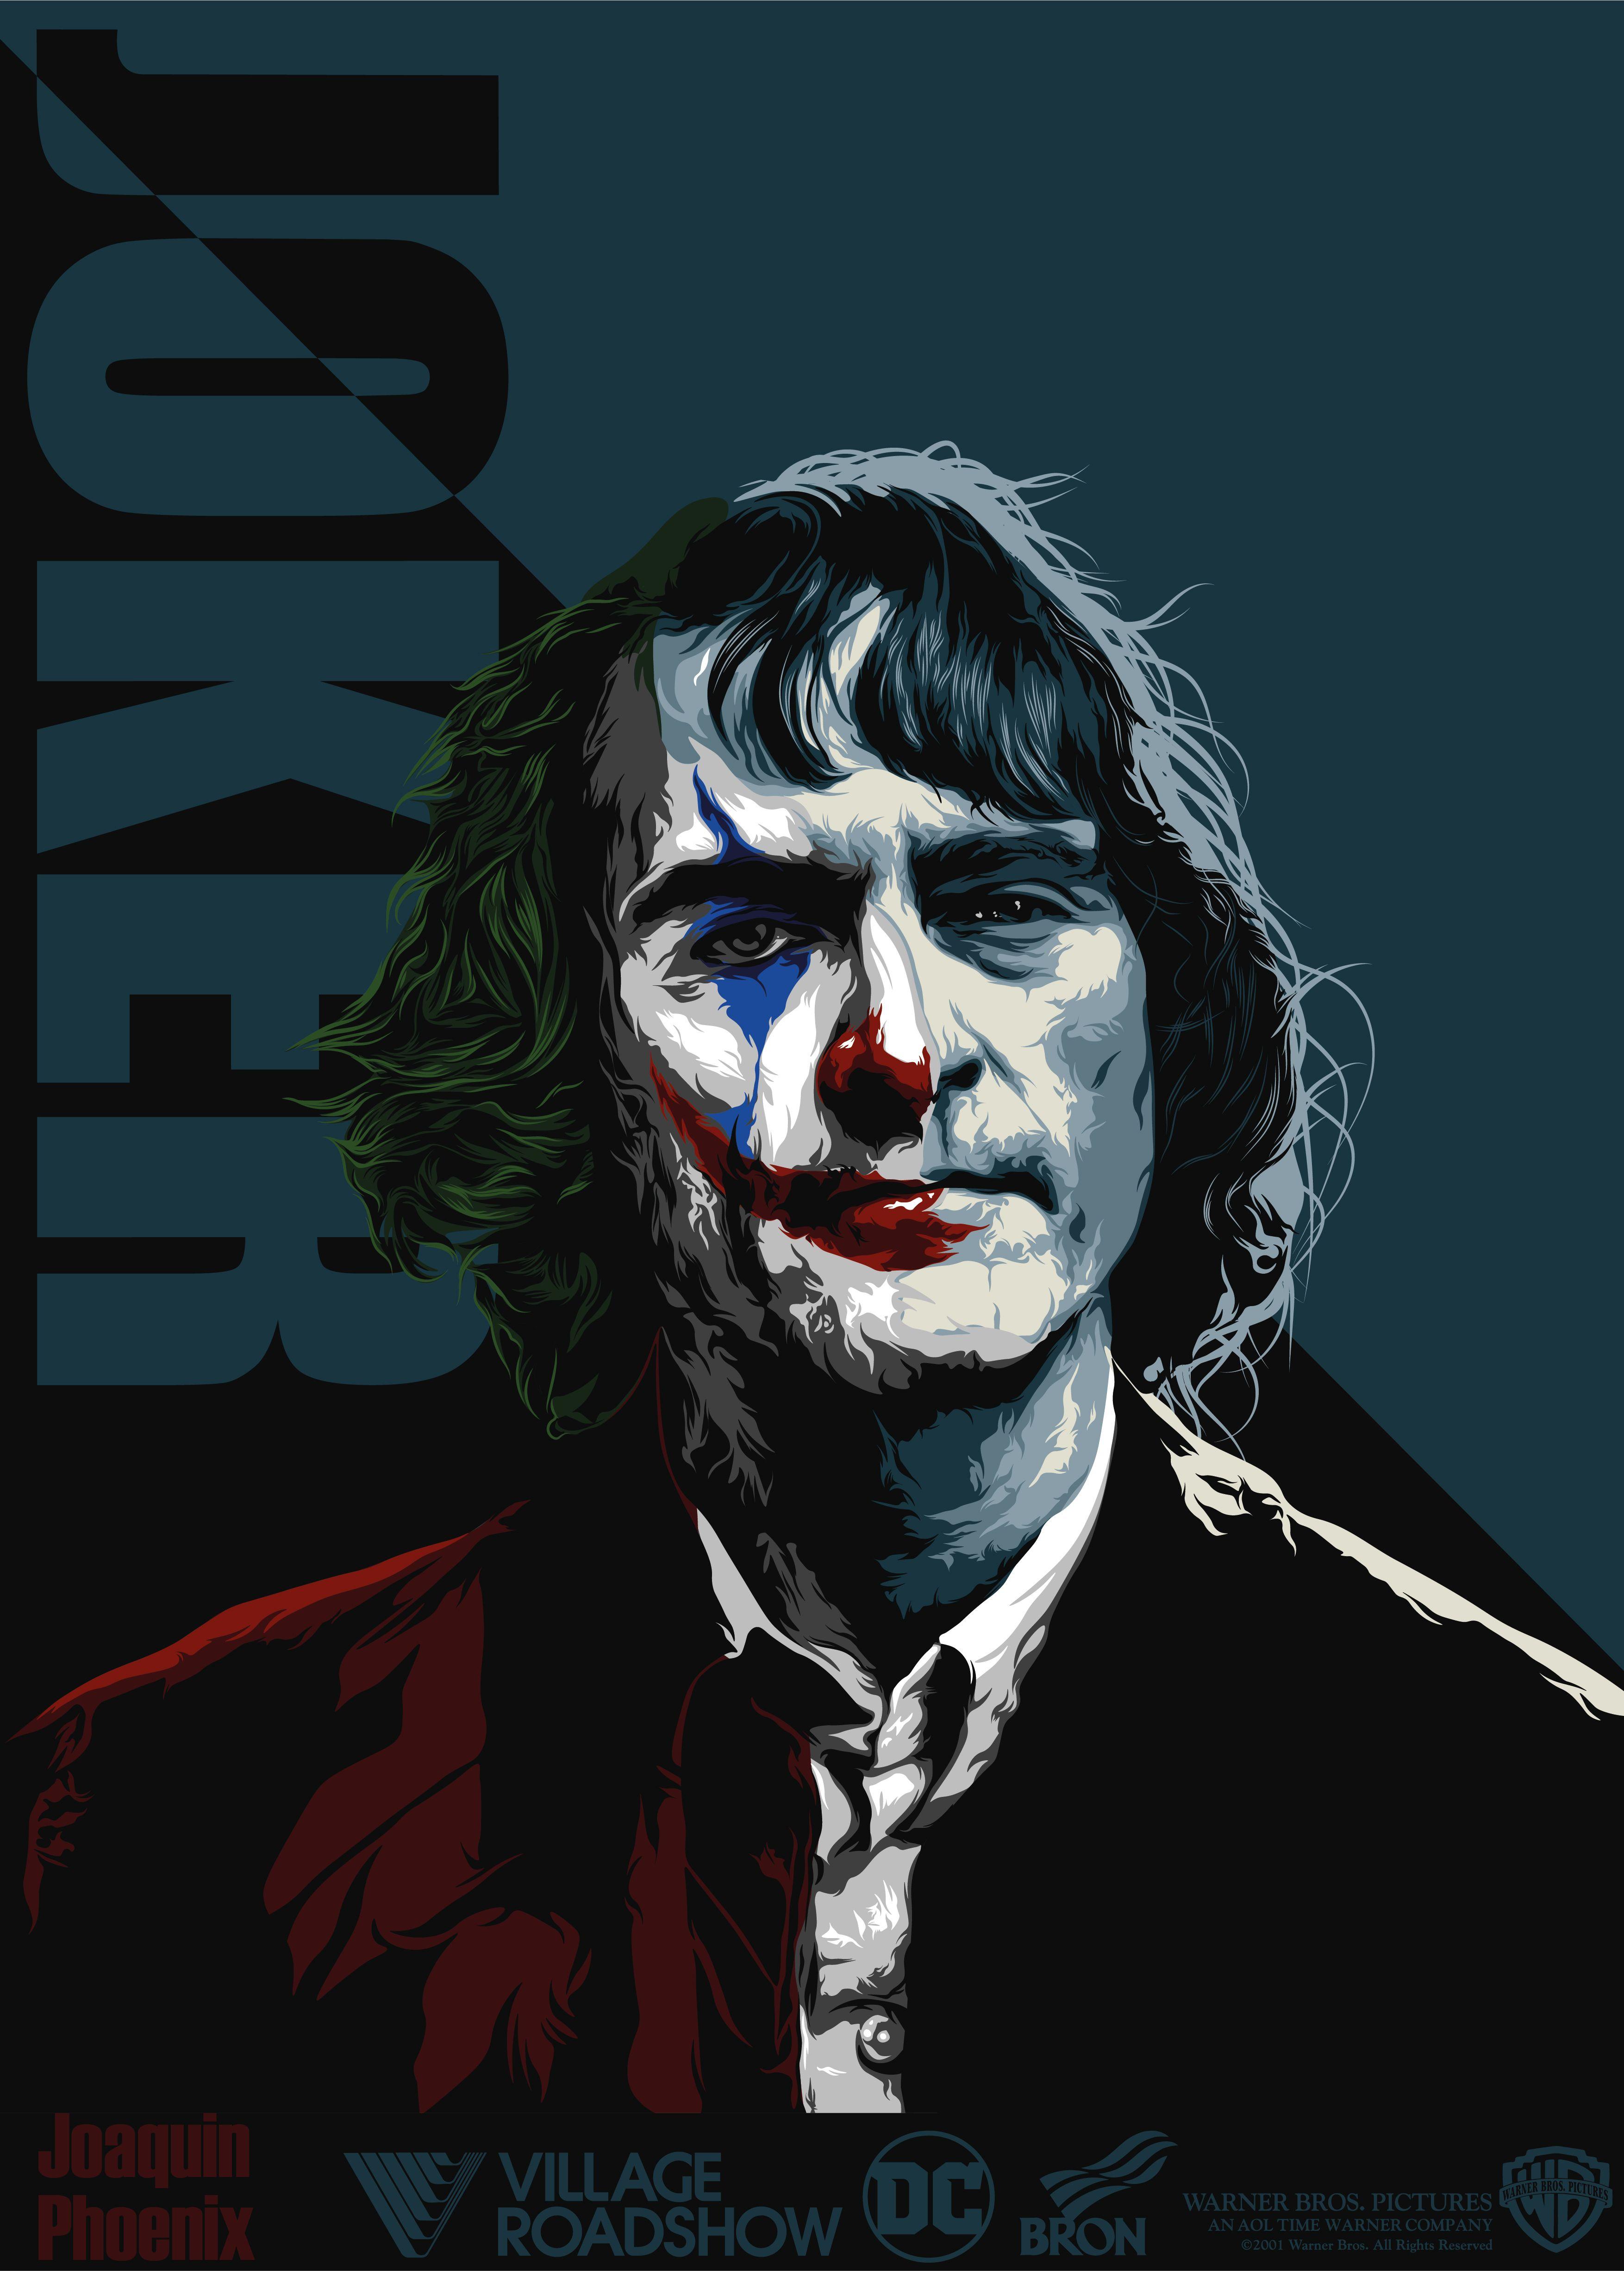 Joaquin Phoenix Joker Illustration In 2020 Illustration Graphic Design Illustration Illustration Design